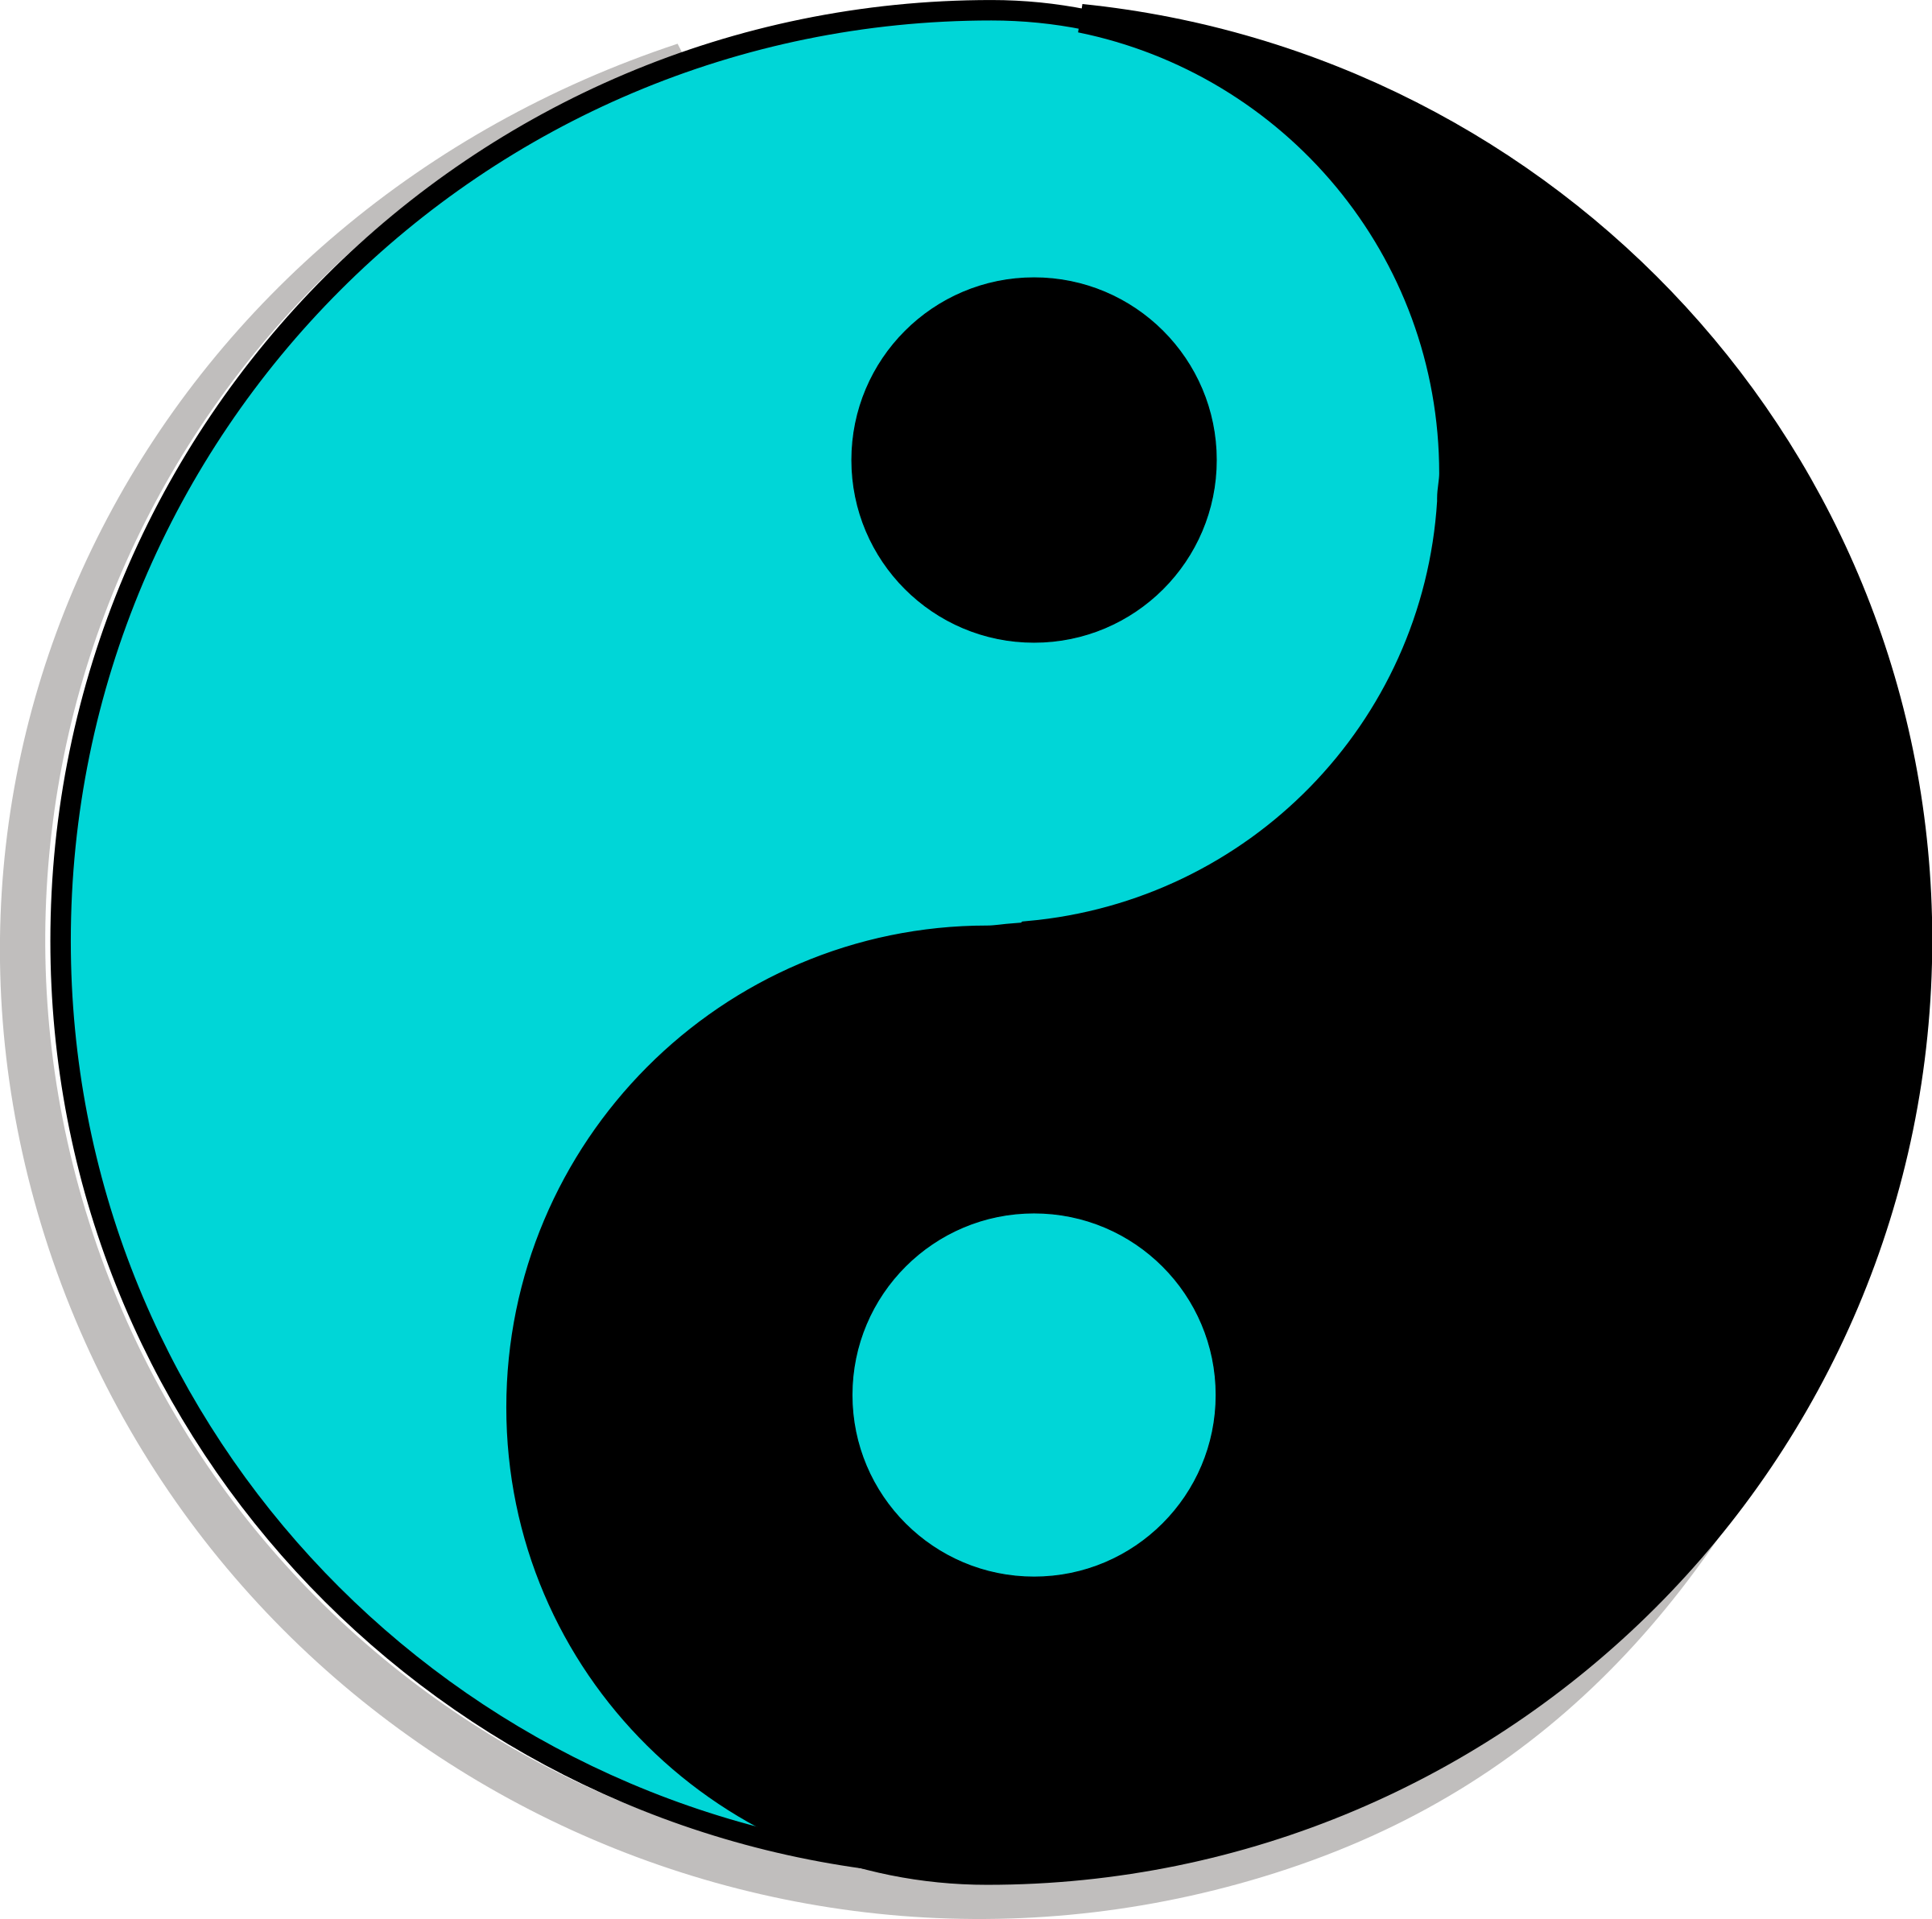 Yin yang symbol free clip art.